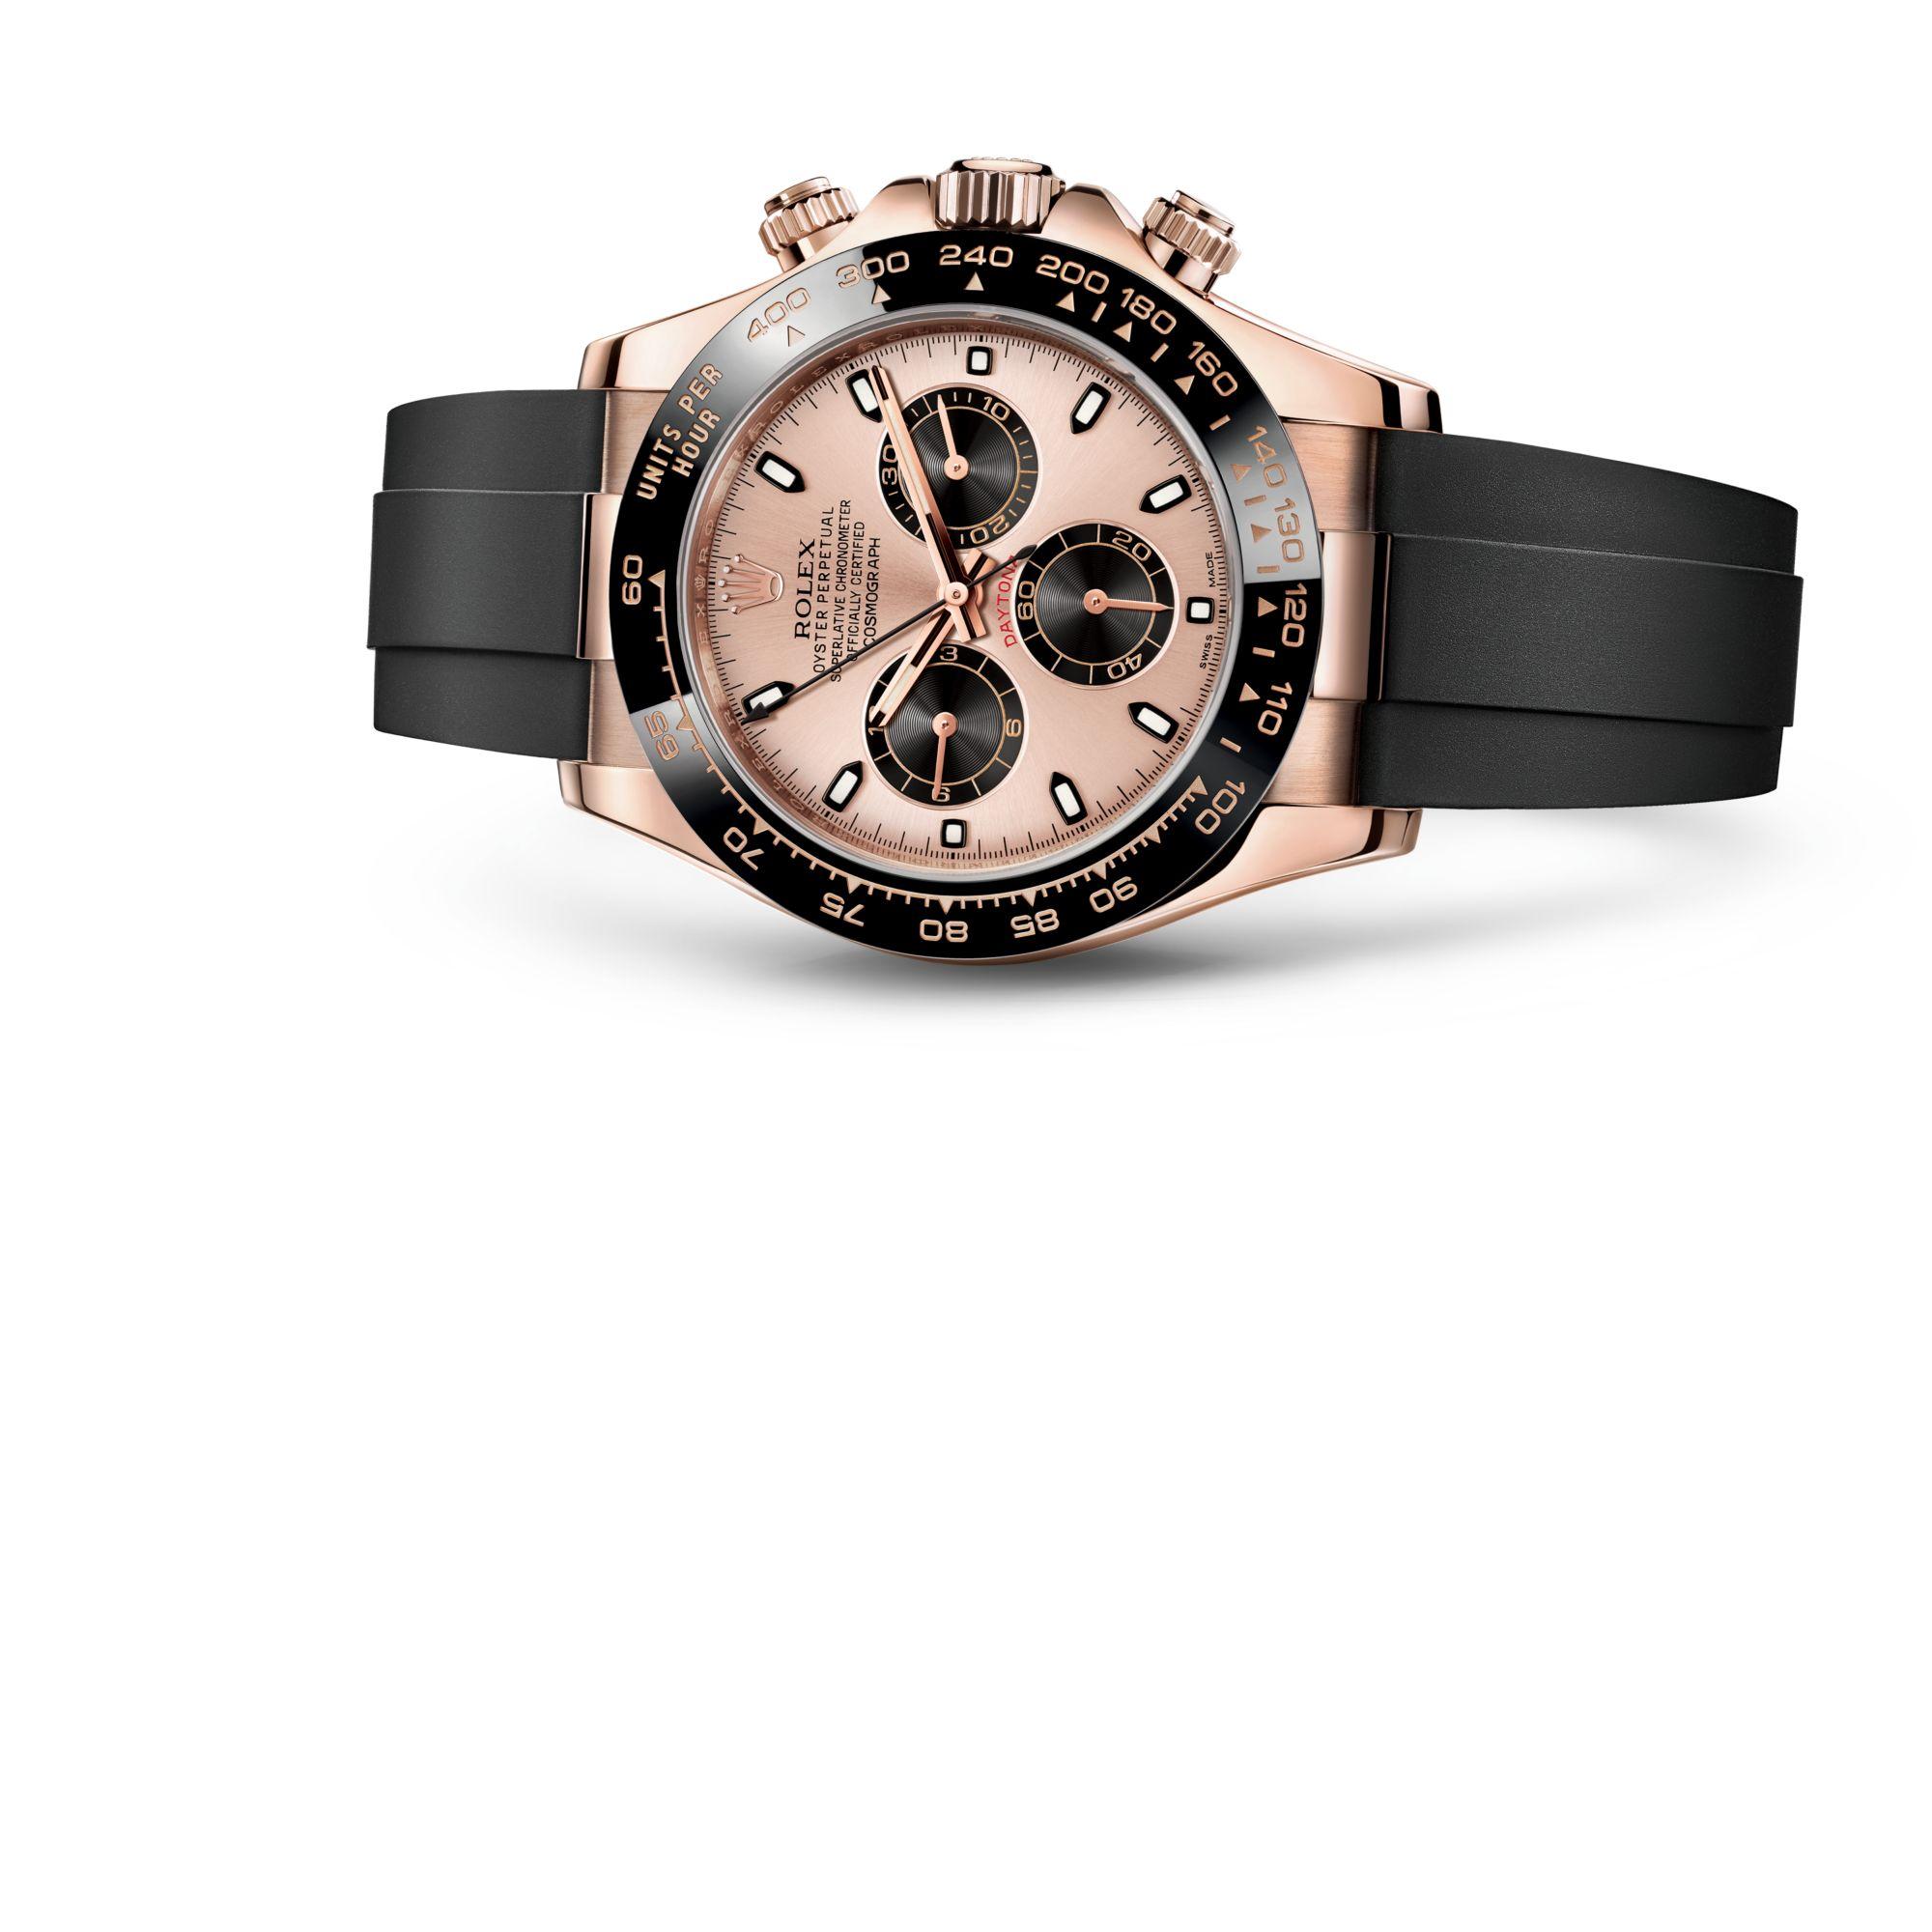 Rolex كوزموغراف دايتونا M116515LN-0013